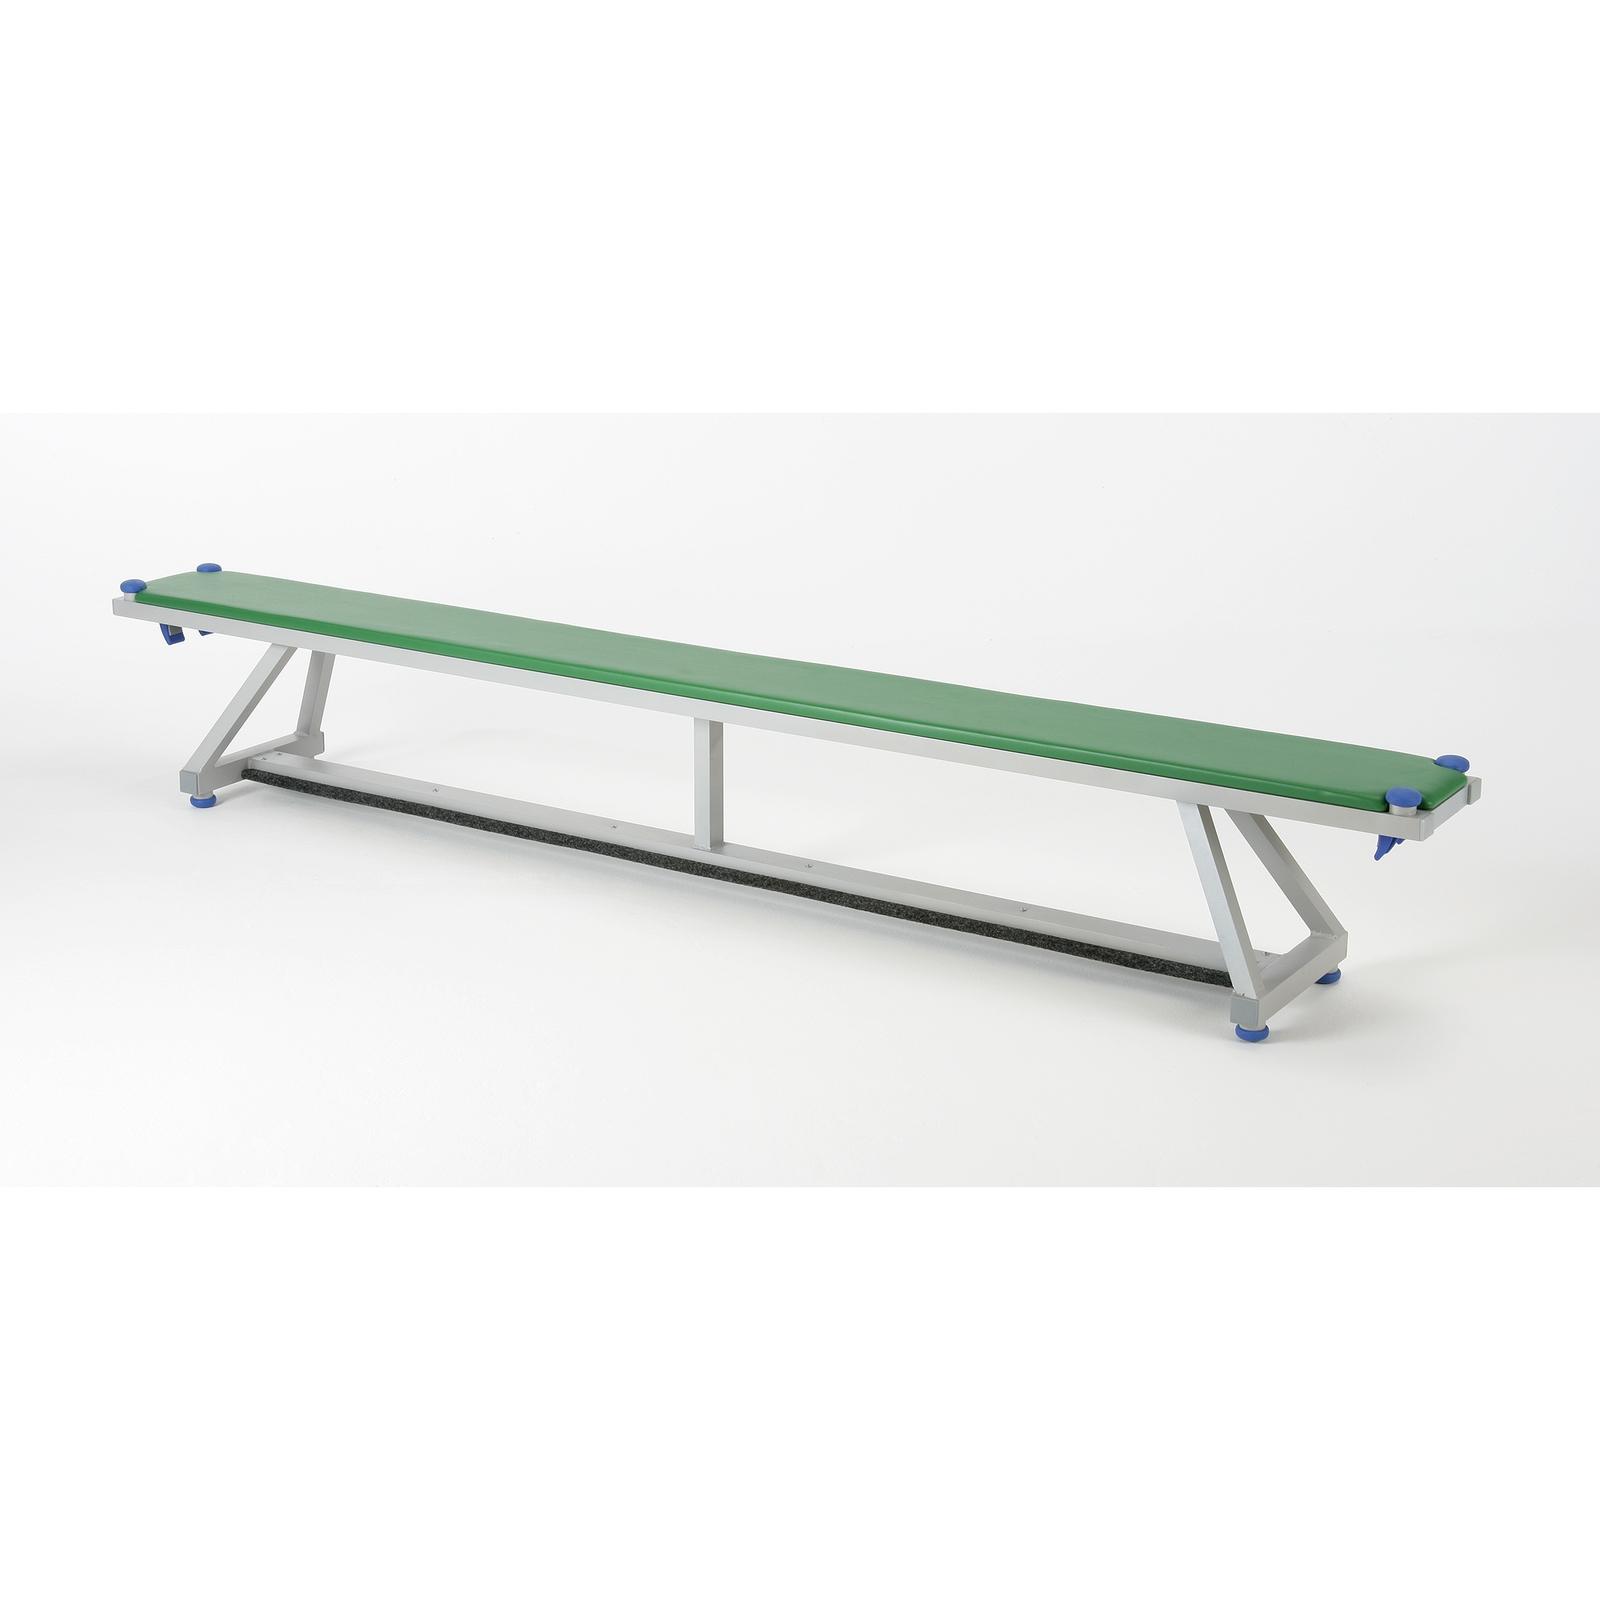 Litabench - Green